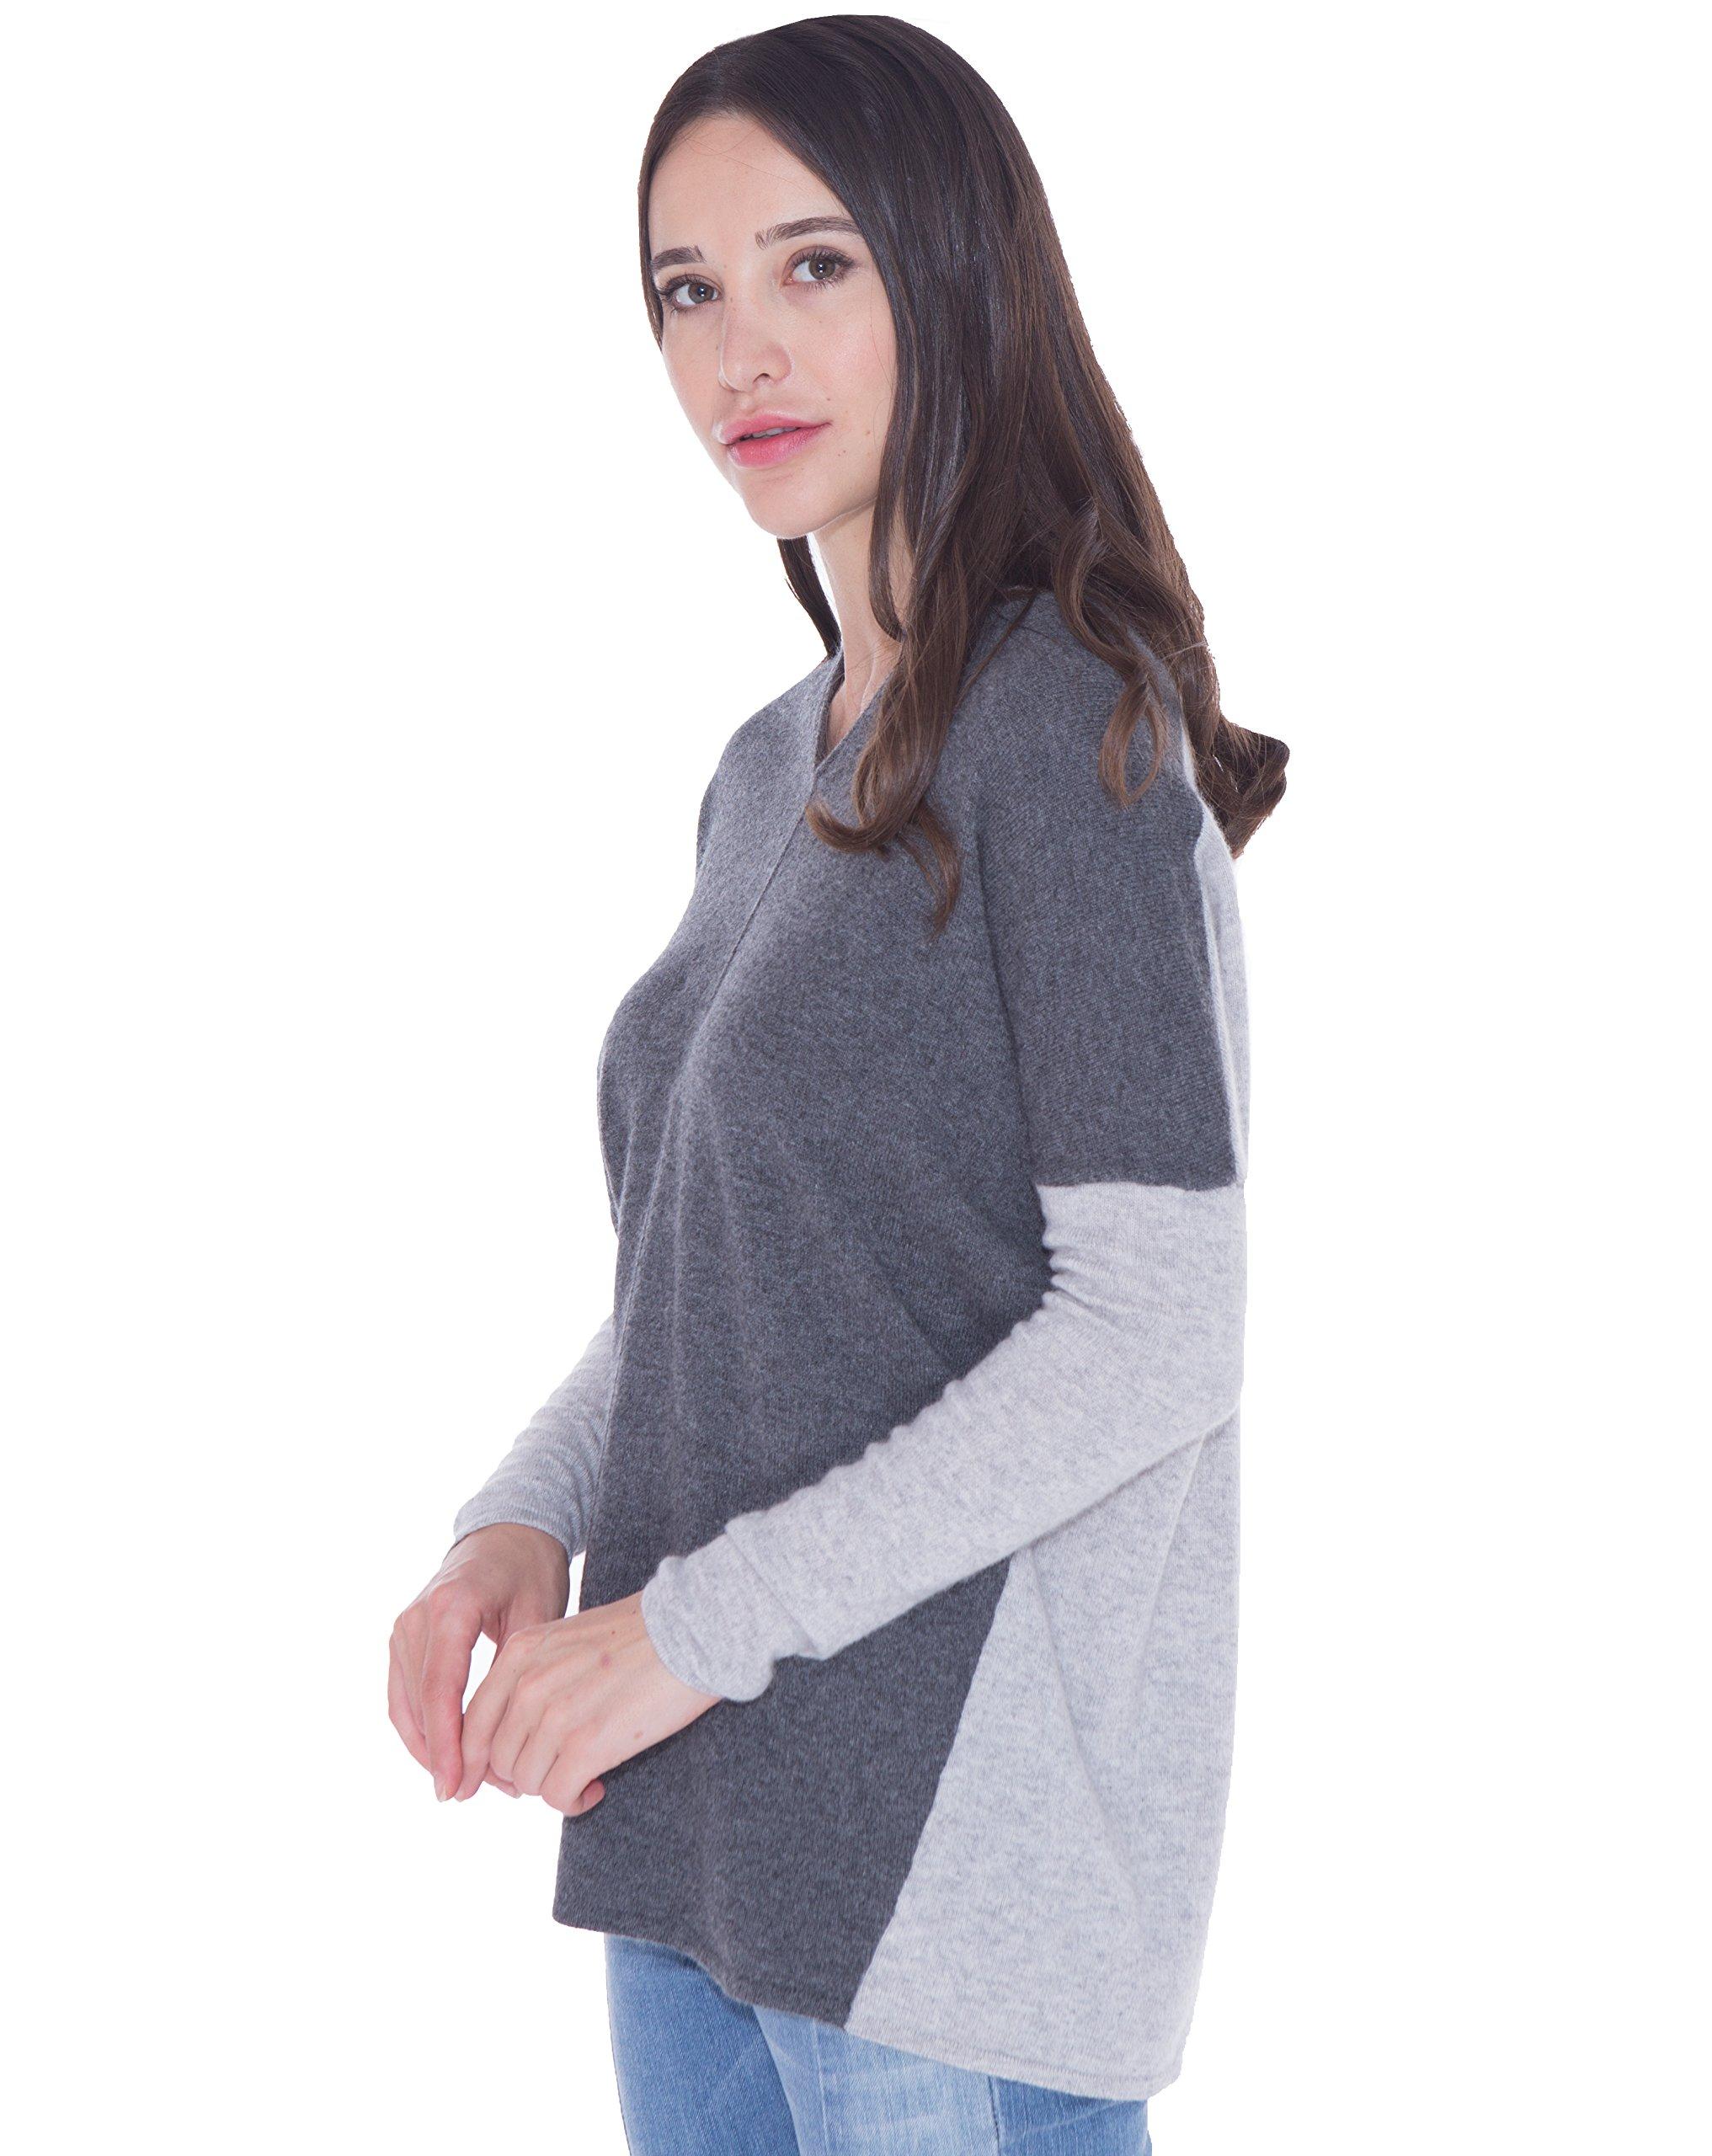 cashmere 4 U Women's 100% Cashmere V-Neck Sweater Pullover Loose Fit Dual-Tone Color